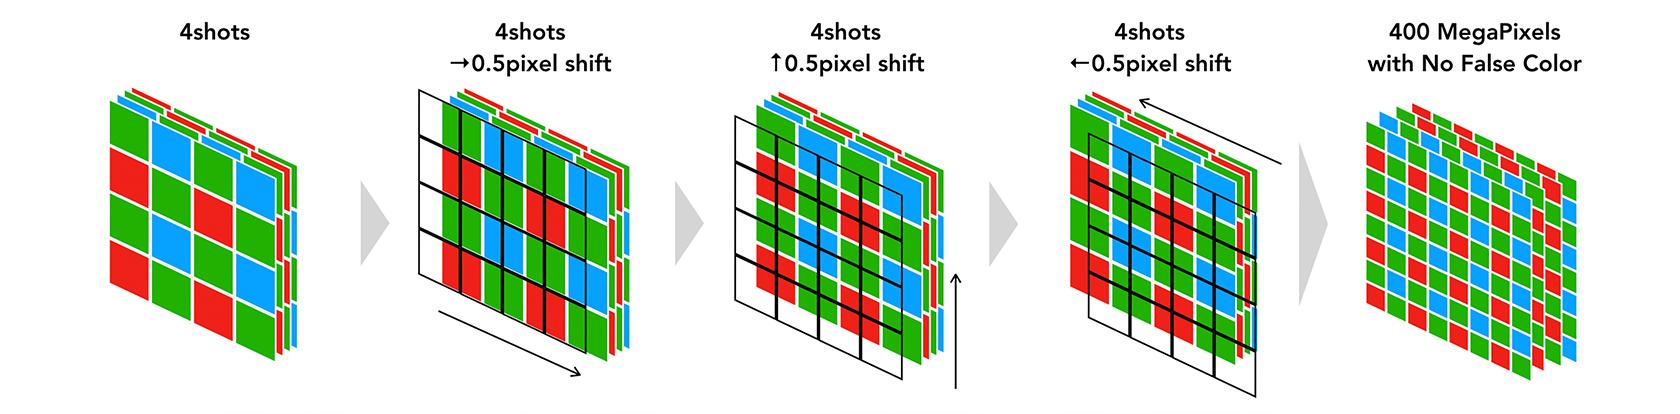 [Image]② The process of quadrupling pixels virtually